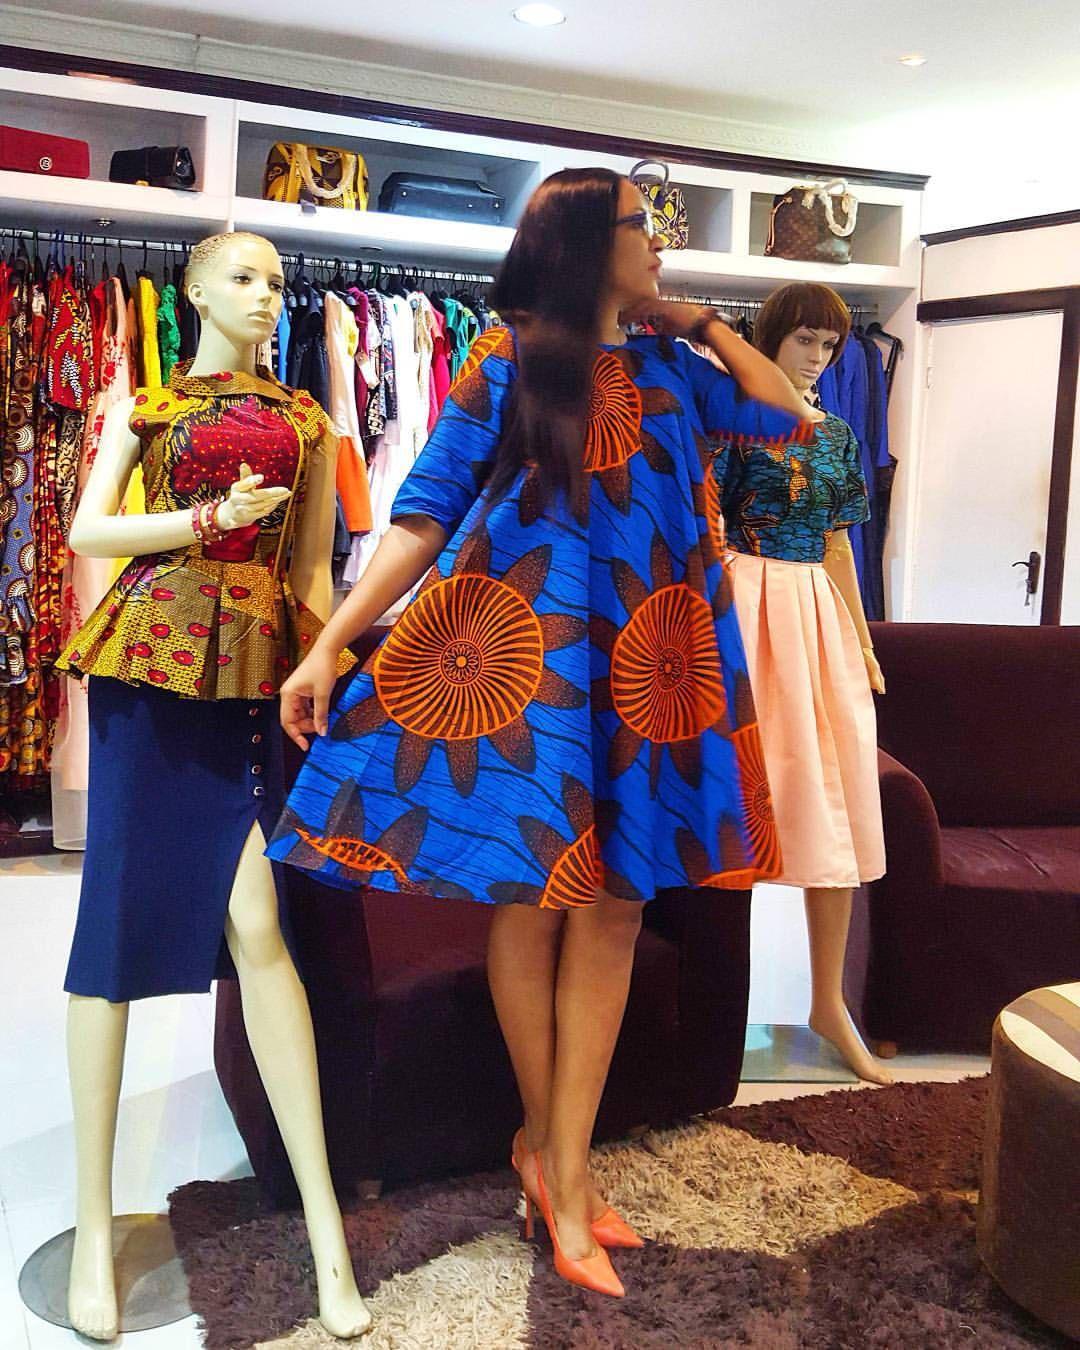 "Kiki's Fashion on Instagram: ""Get the look at Kiki's Fashion Boutique  #kikisfashion#kikisdesign#kikisdress#africanfashion @kikizimba"""